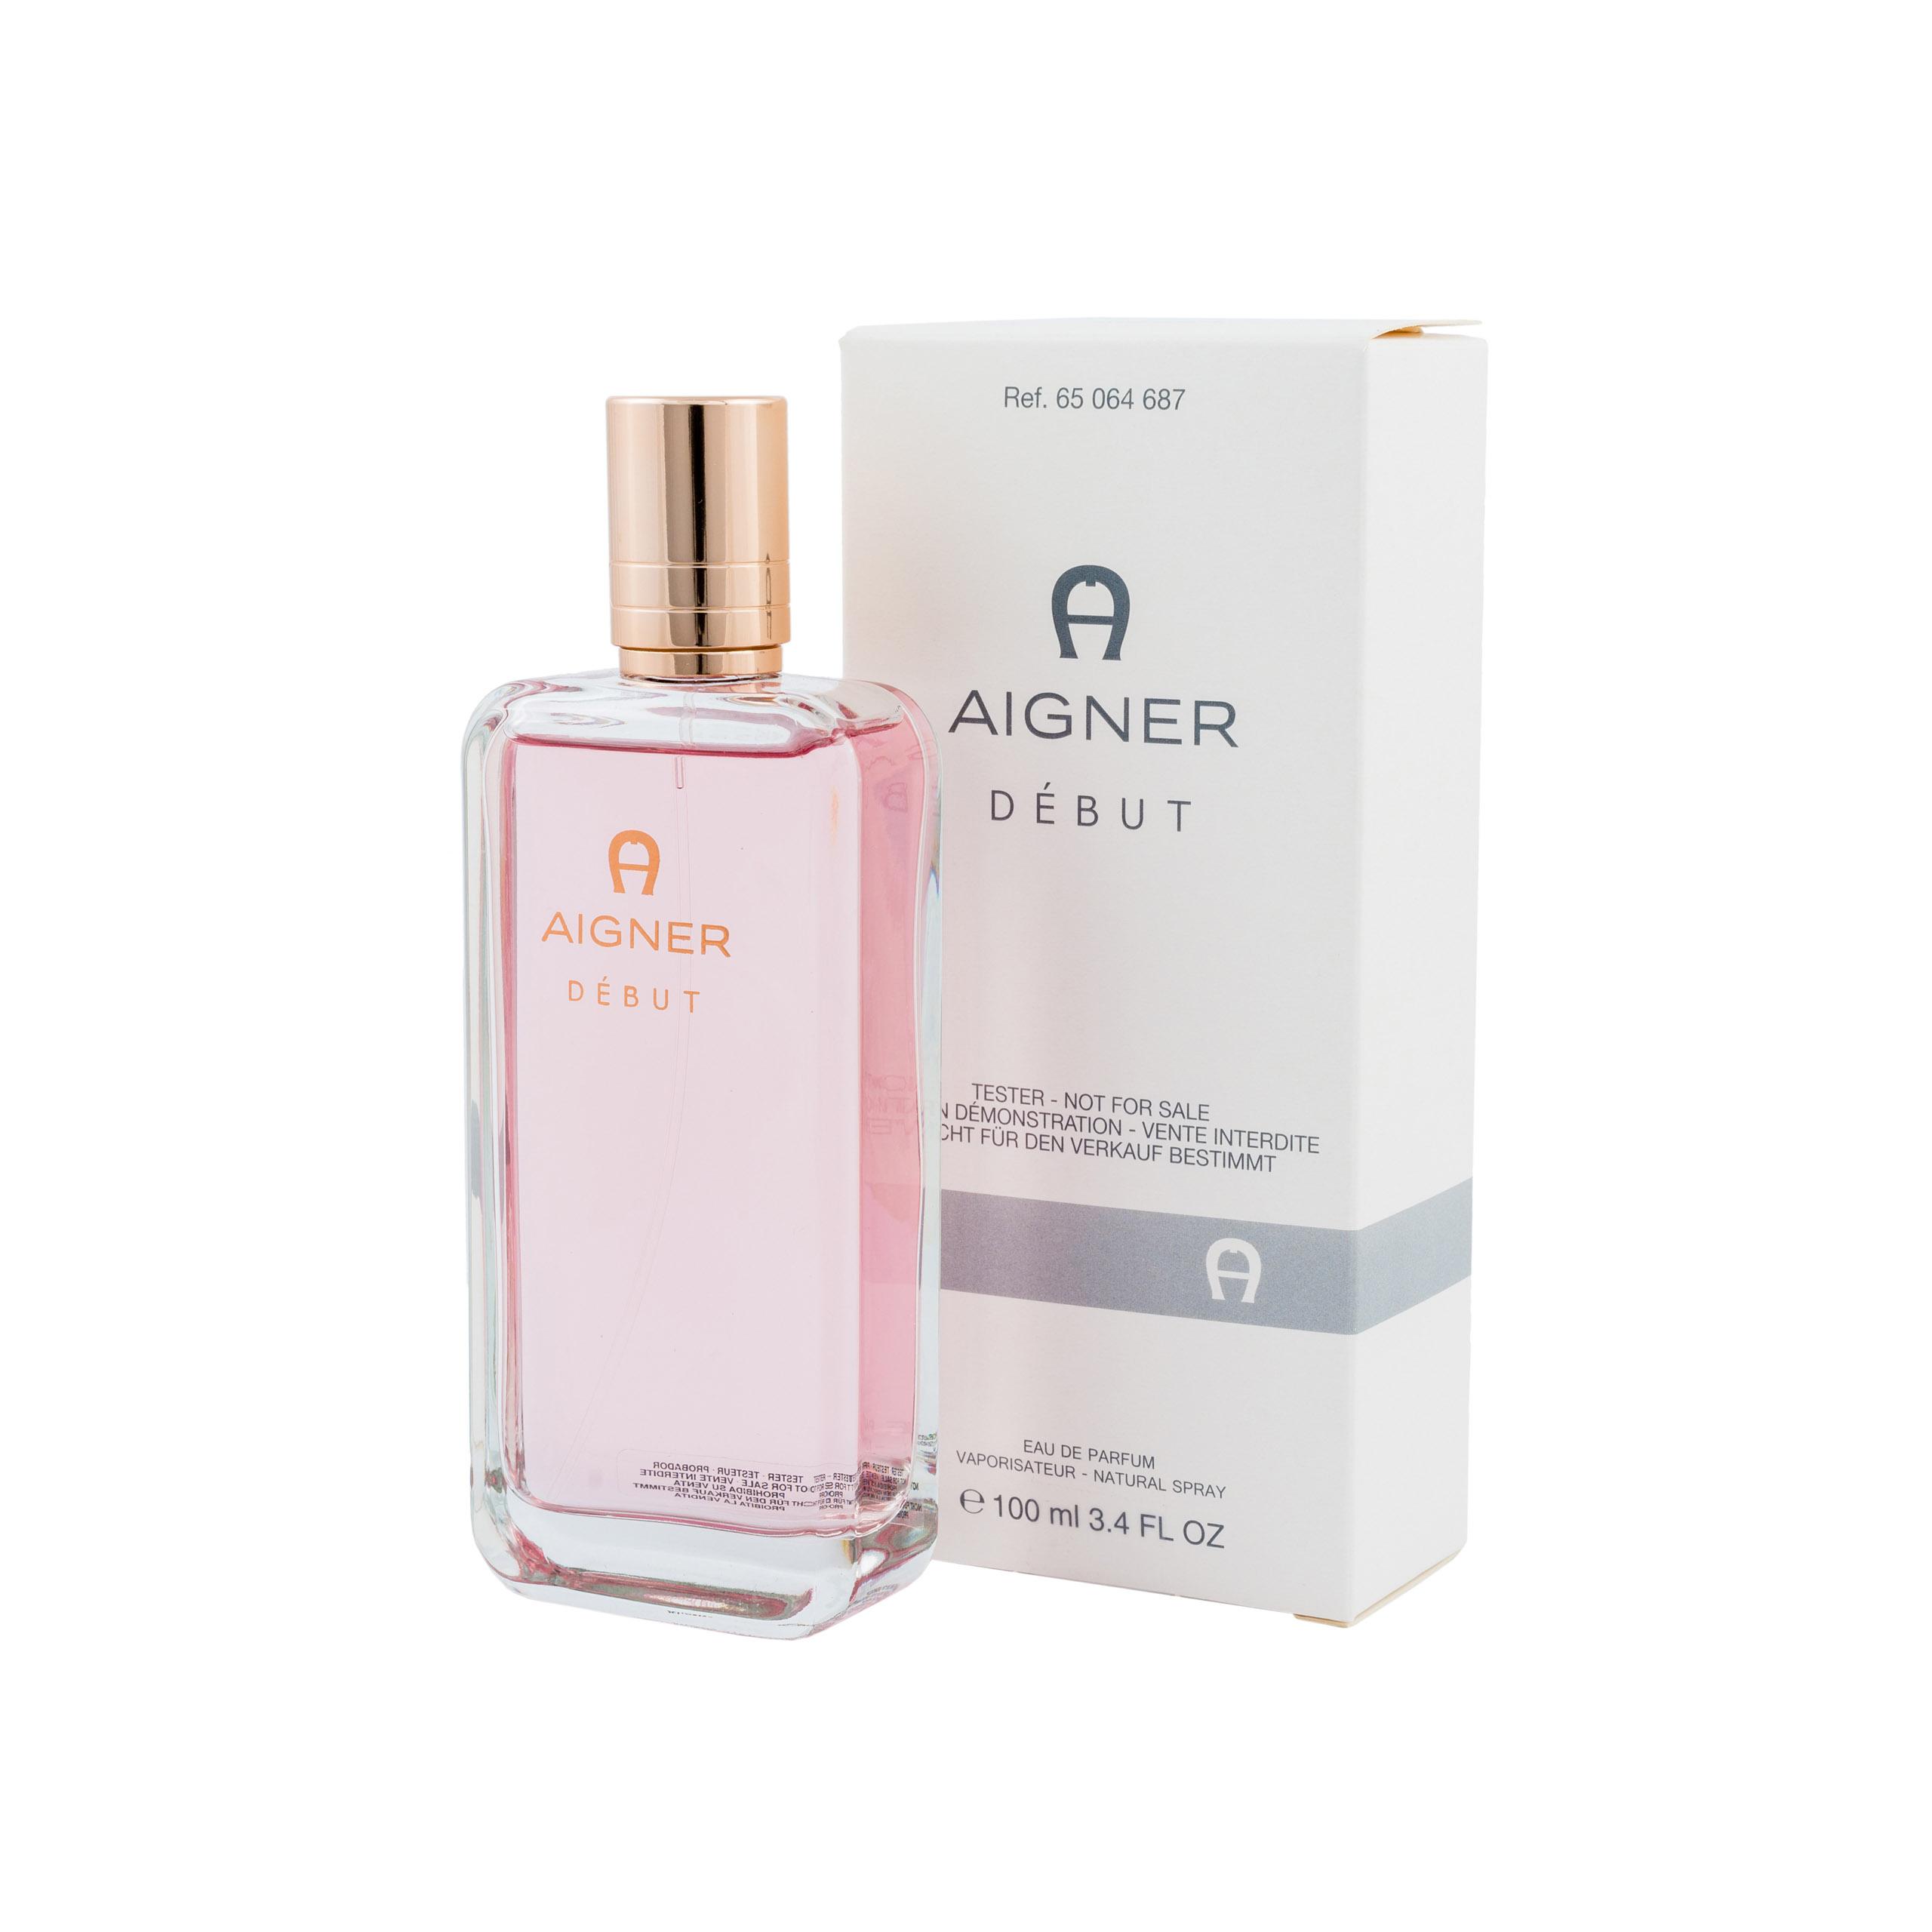 Aigner Debut woda perfumowana 100 ml spray